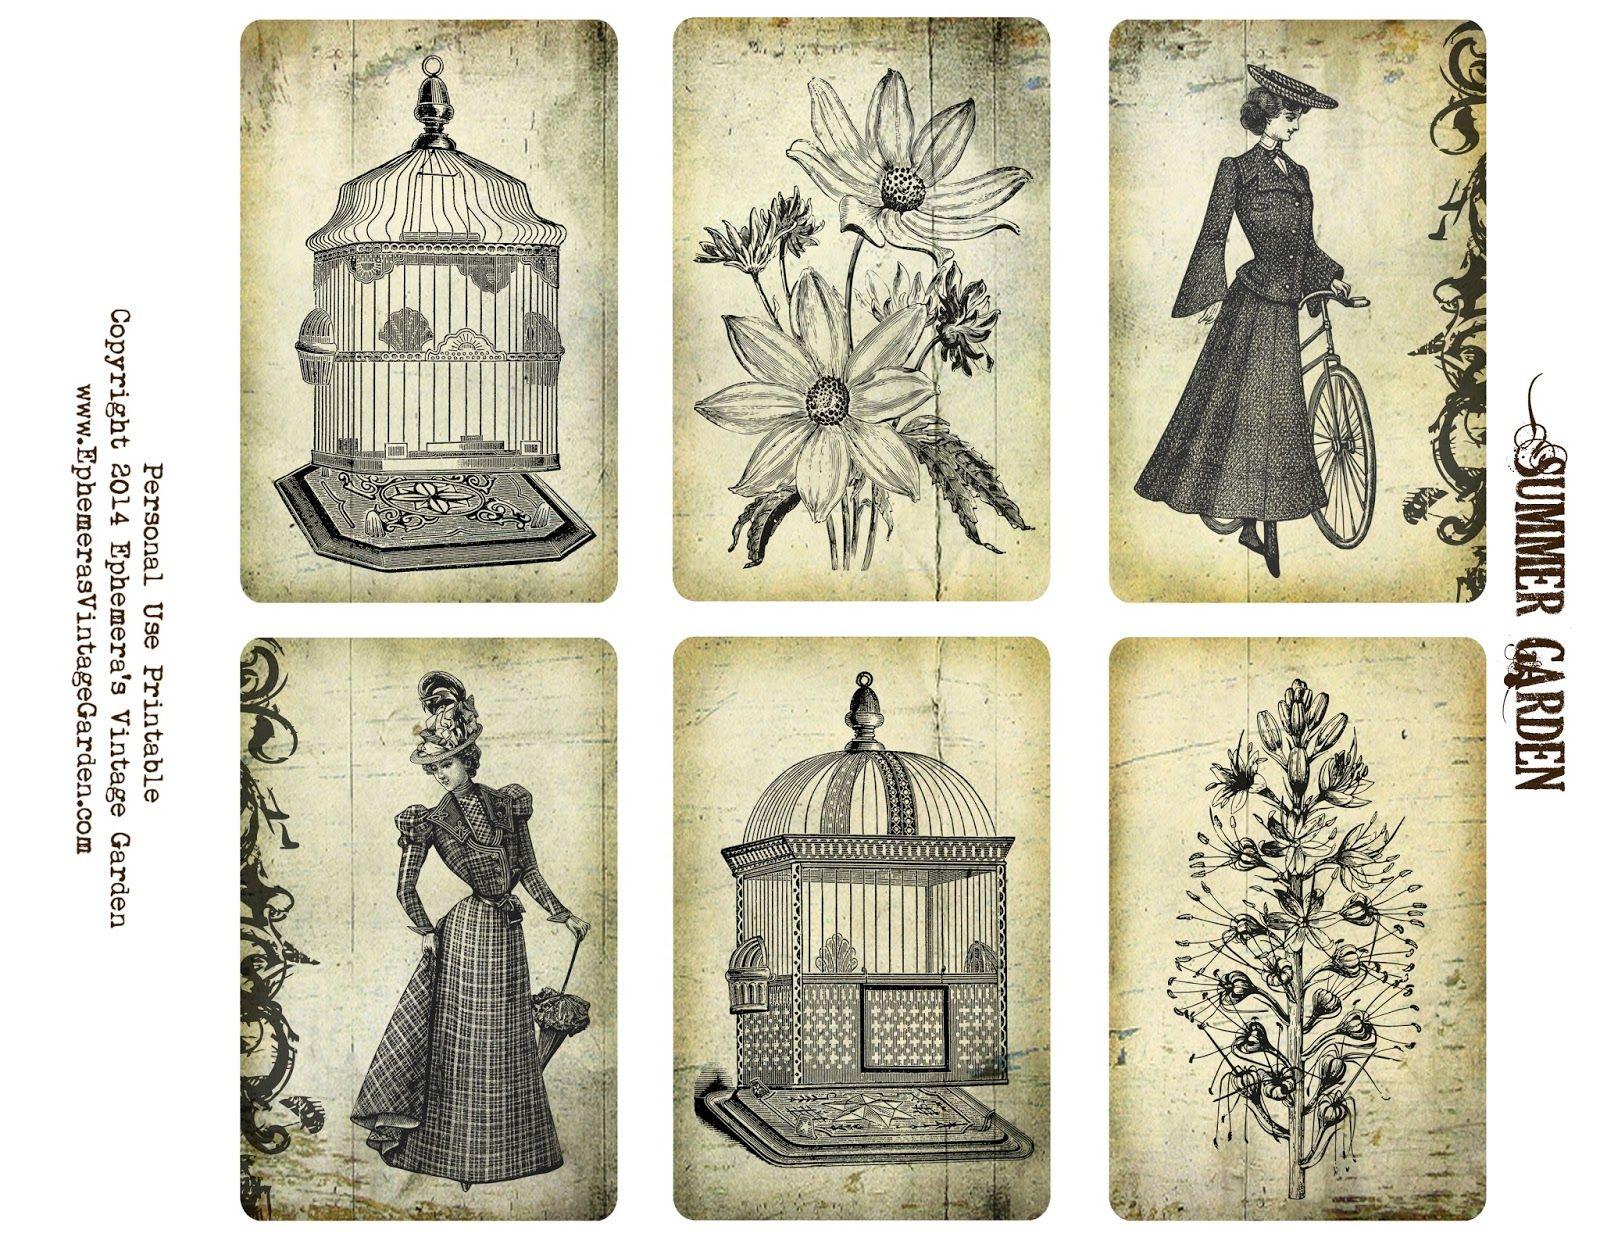 Ephemera's Vintage Garden: Free Printable - Summer Garden Cards. For personal use only.